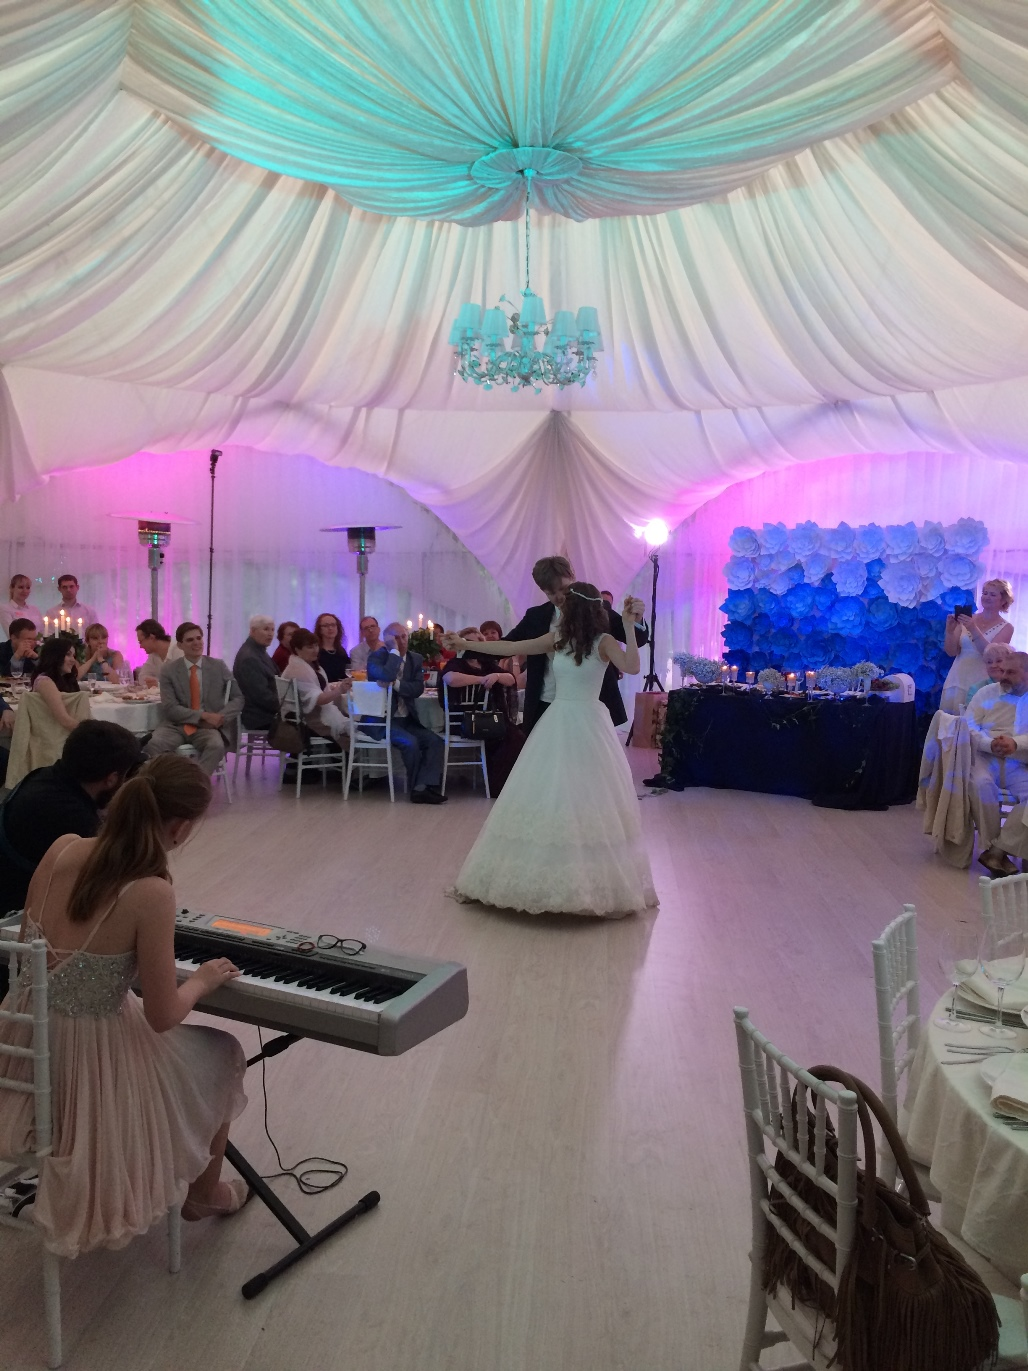 Фото свадеб в павильоне